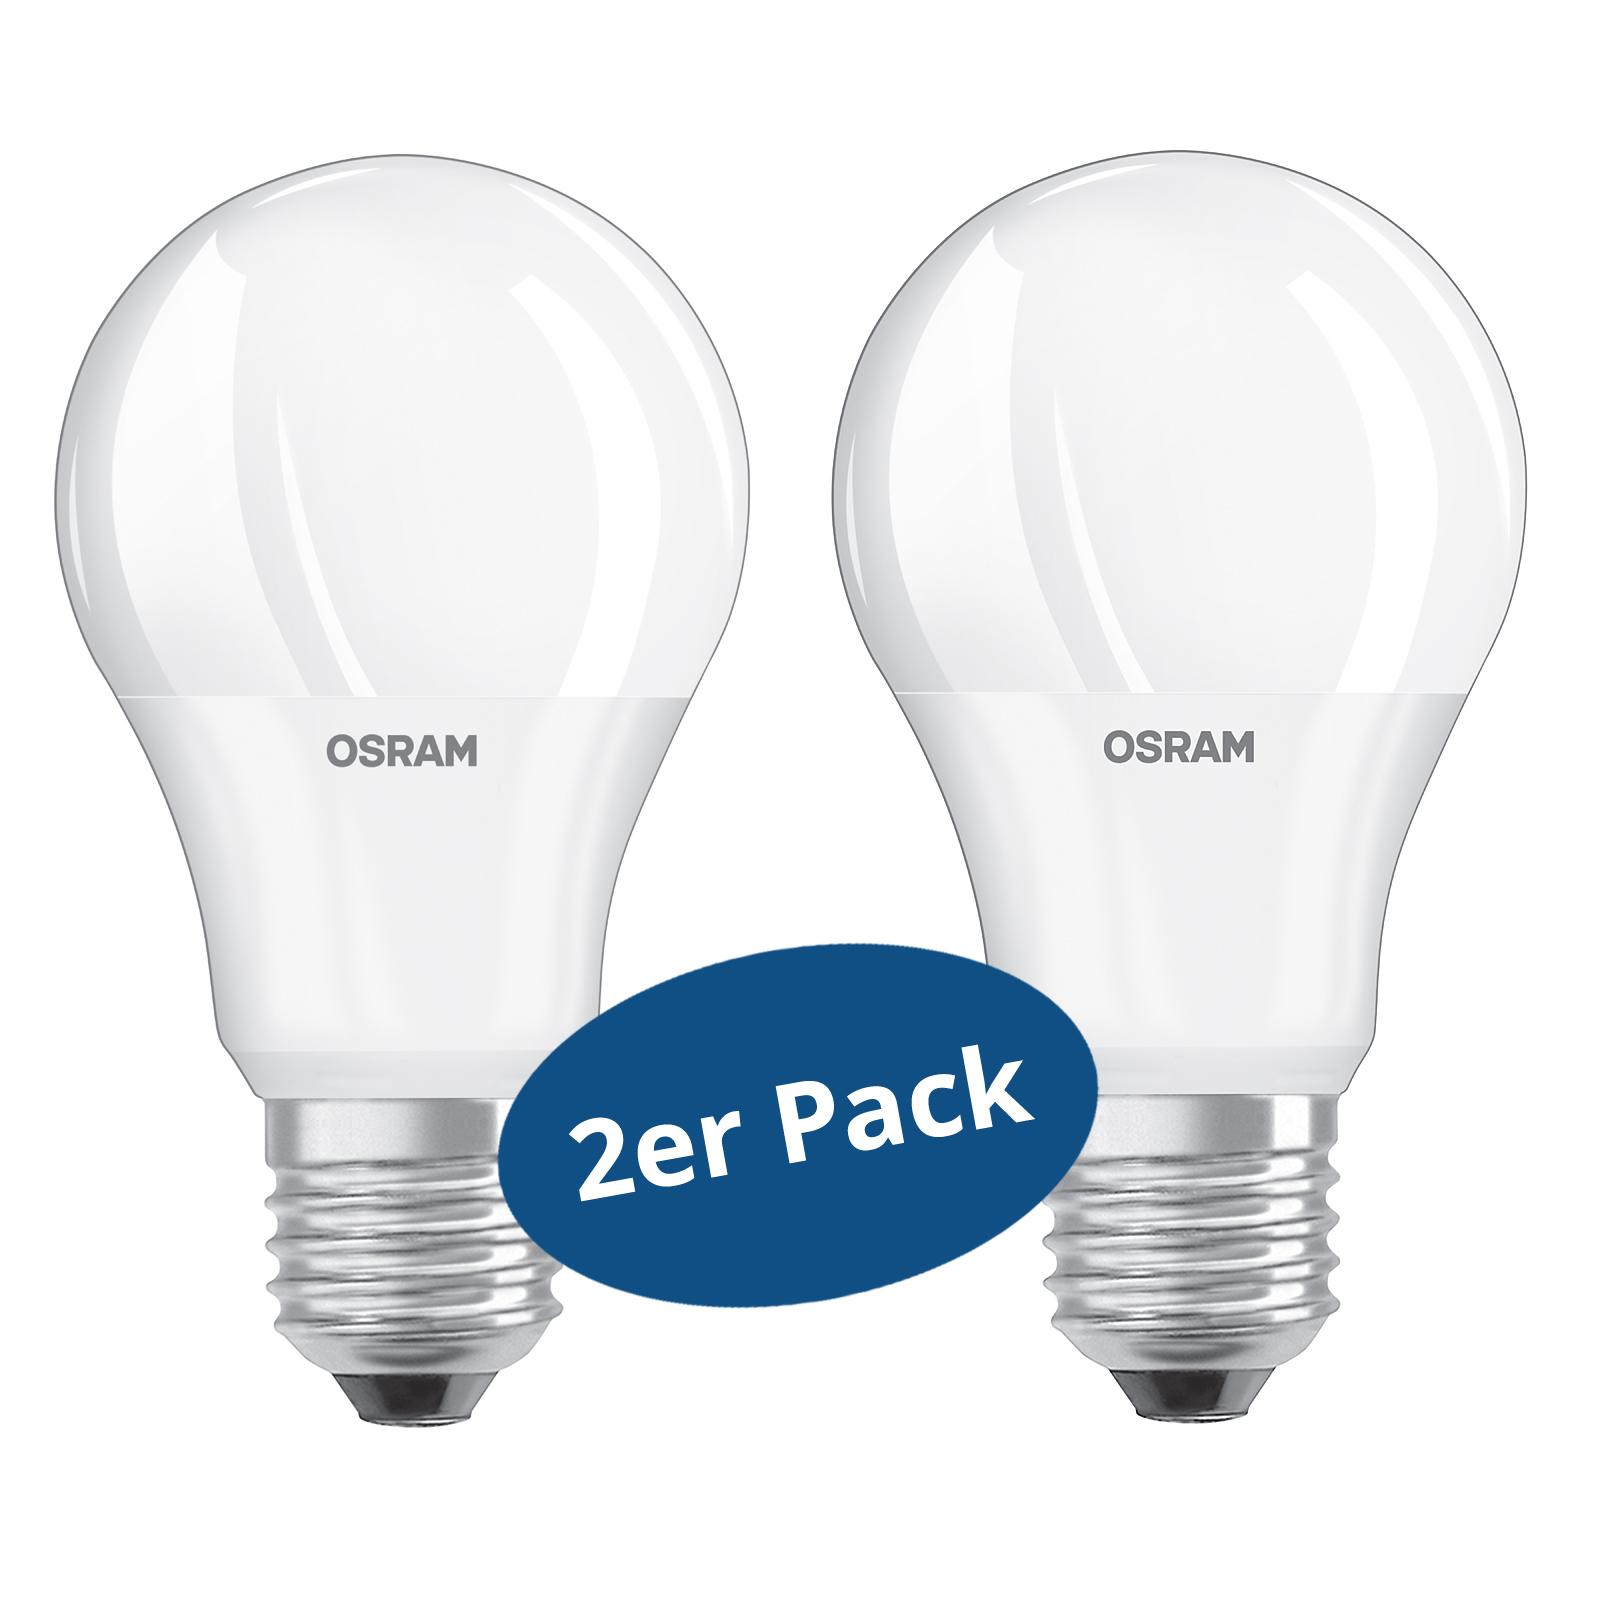 led lampe osram classic a 60 8 5w ersatz f r 60 watt 806. Black Bedroom Furniture Sets. Home Design Ideas